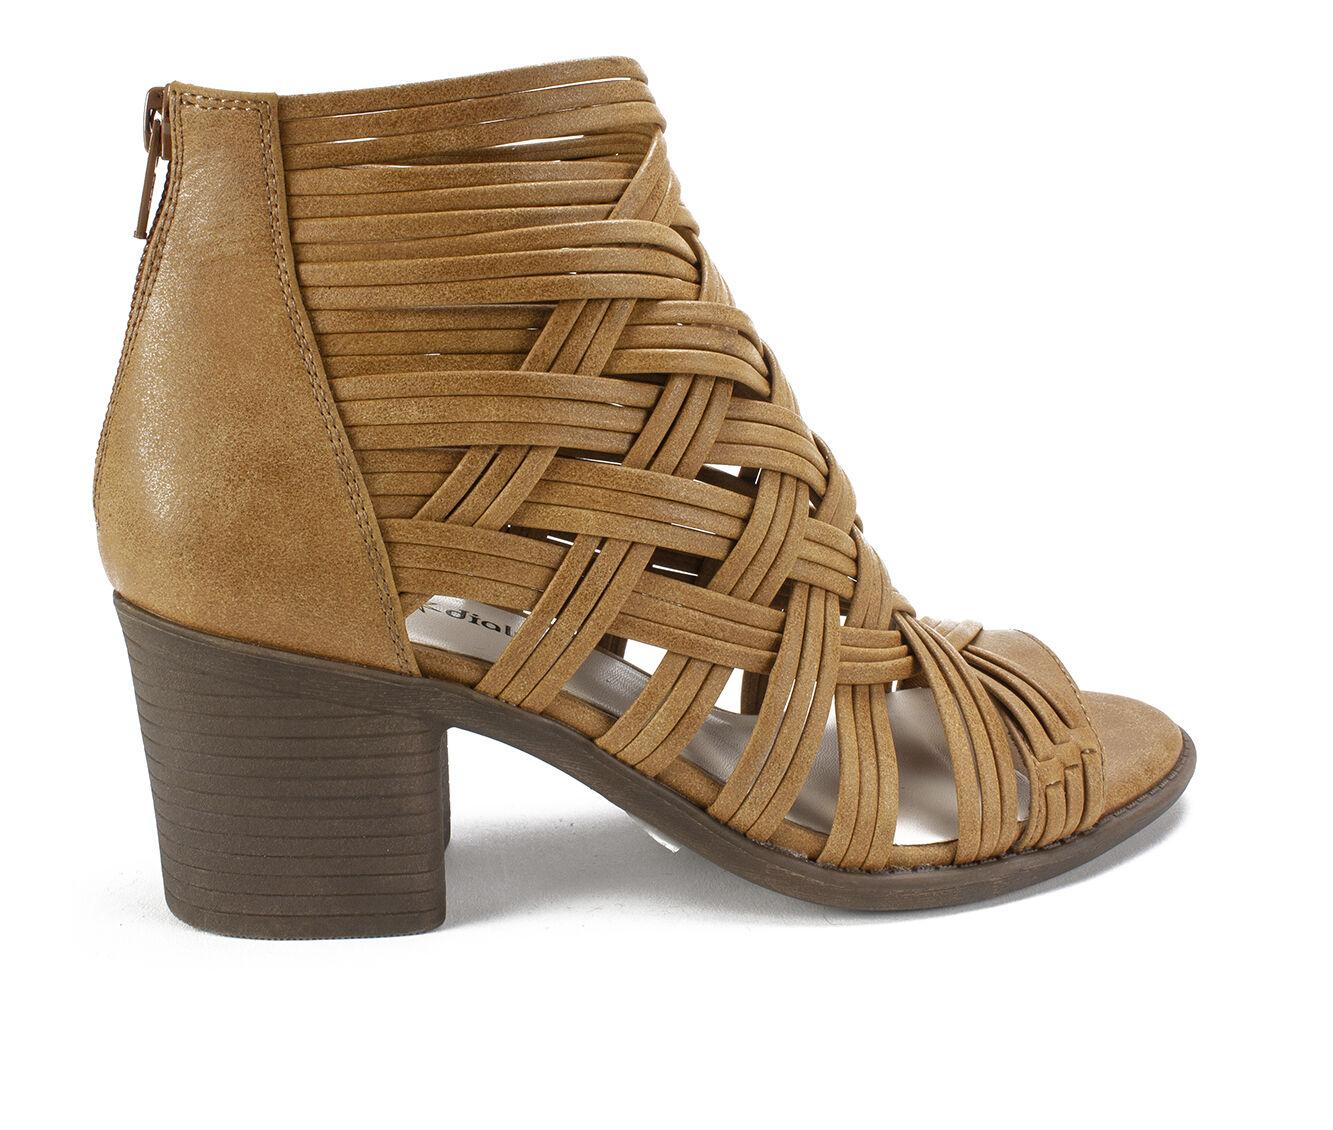 Women's Seven Dials Brixton Strappy Heeled Sandals Tan